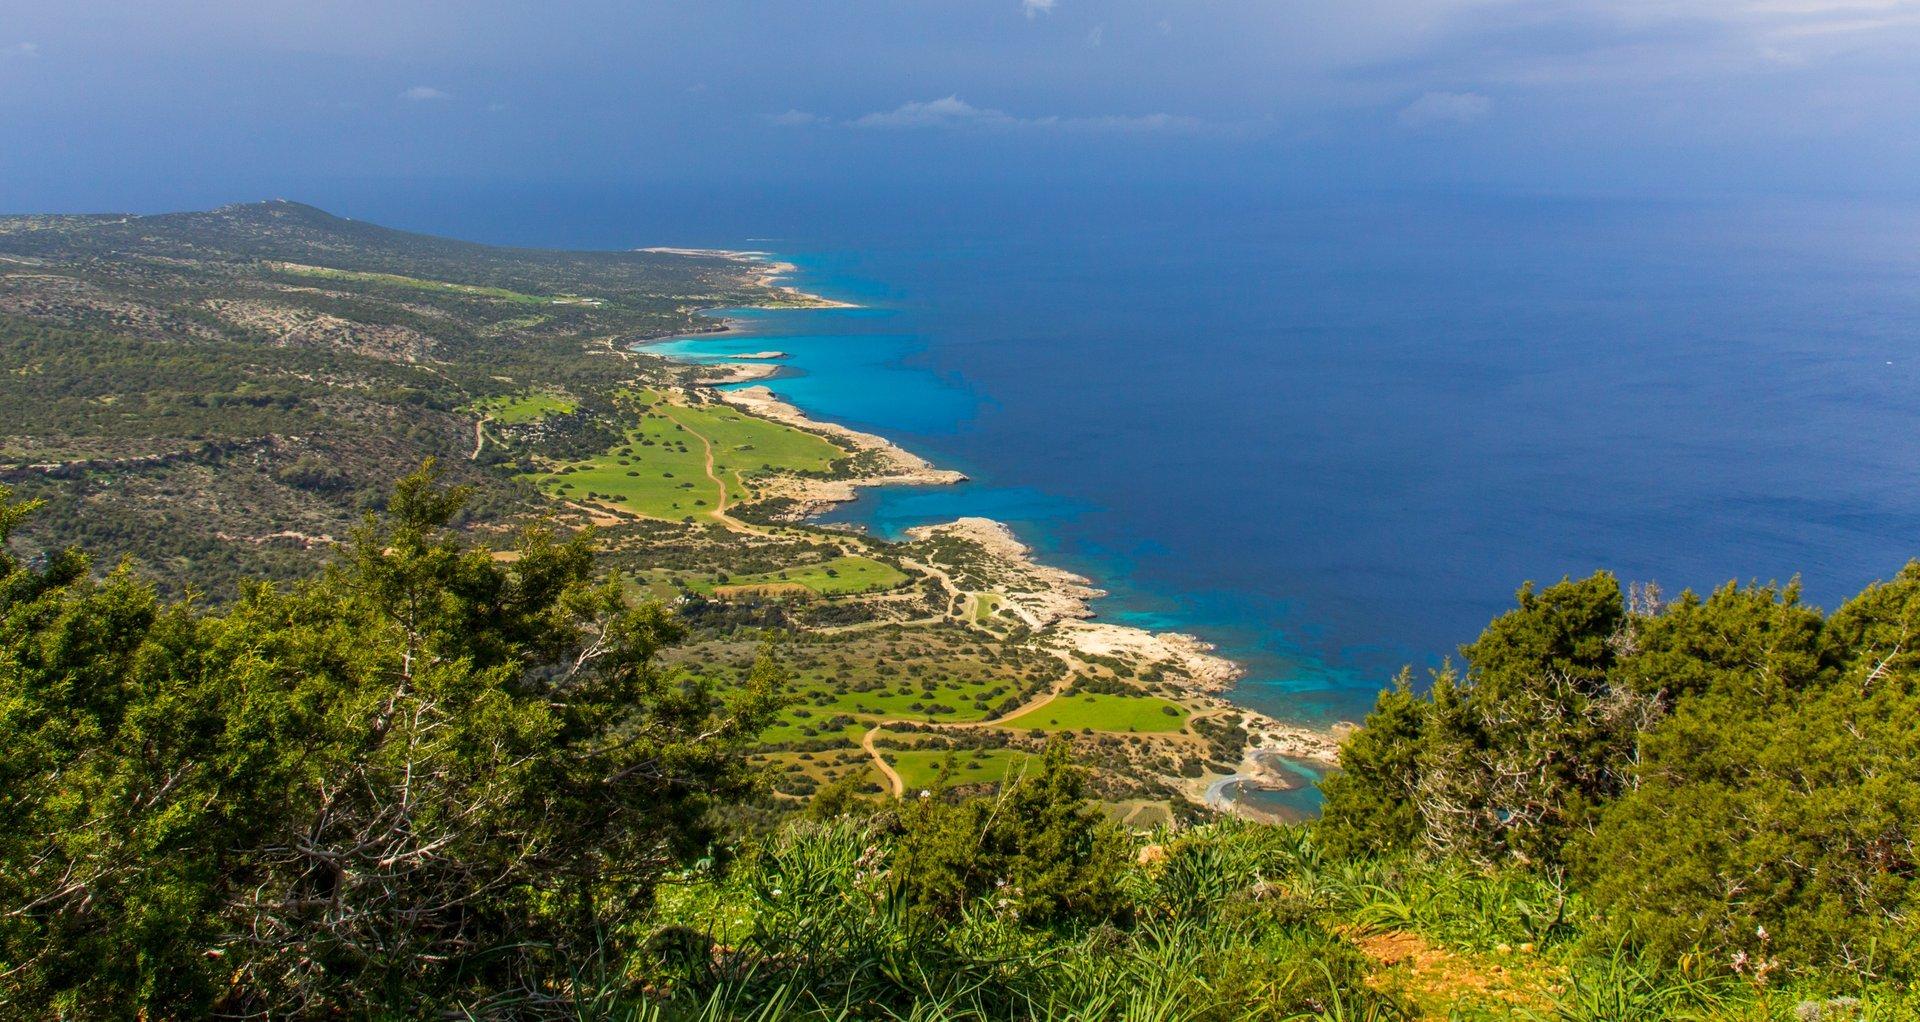 Aphrodite Trail Abloom in Cyprus - Best Season 2020